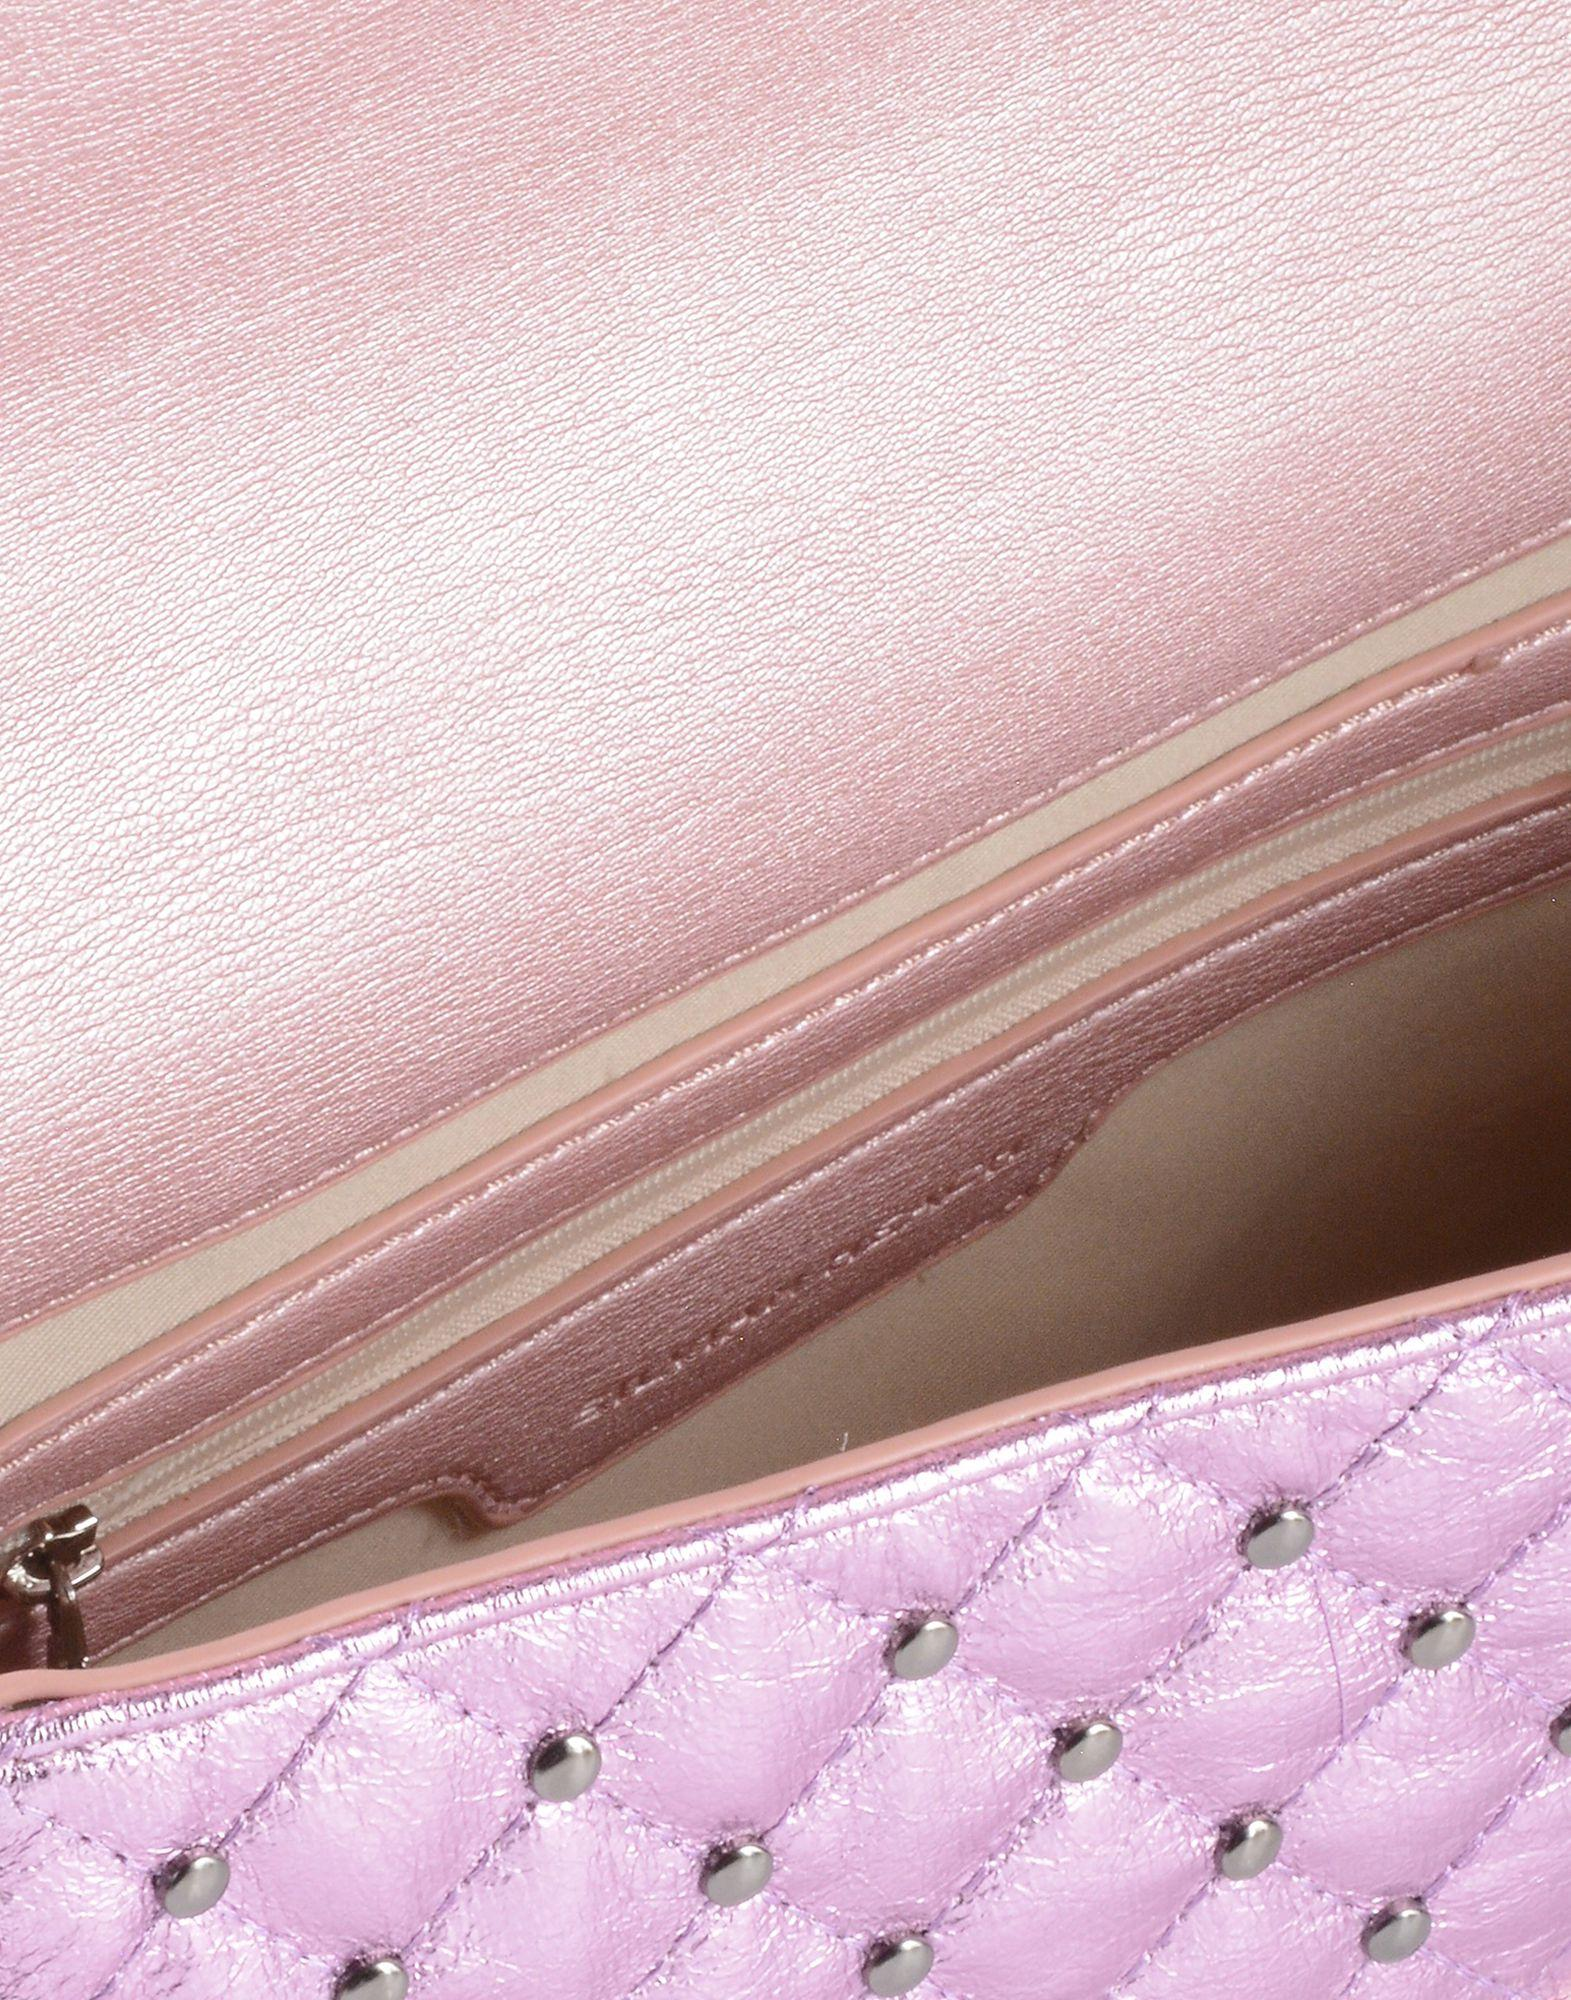 Sac à main Silvian Heach en coloris Rose 3KGM